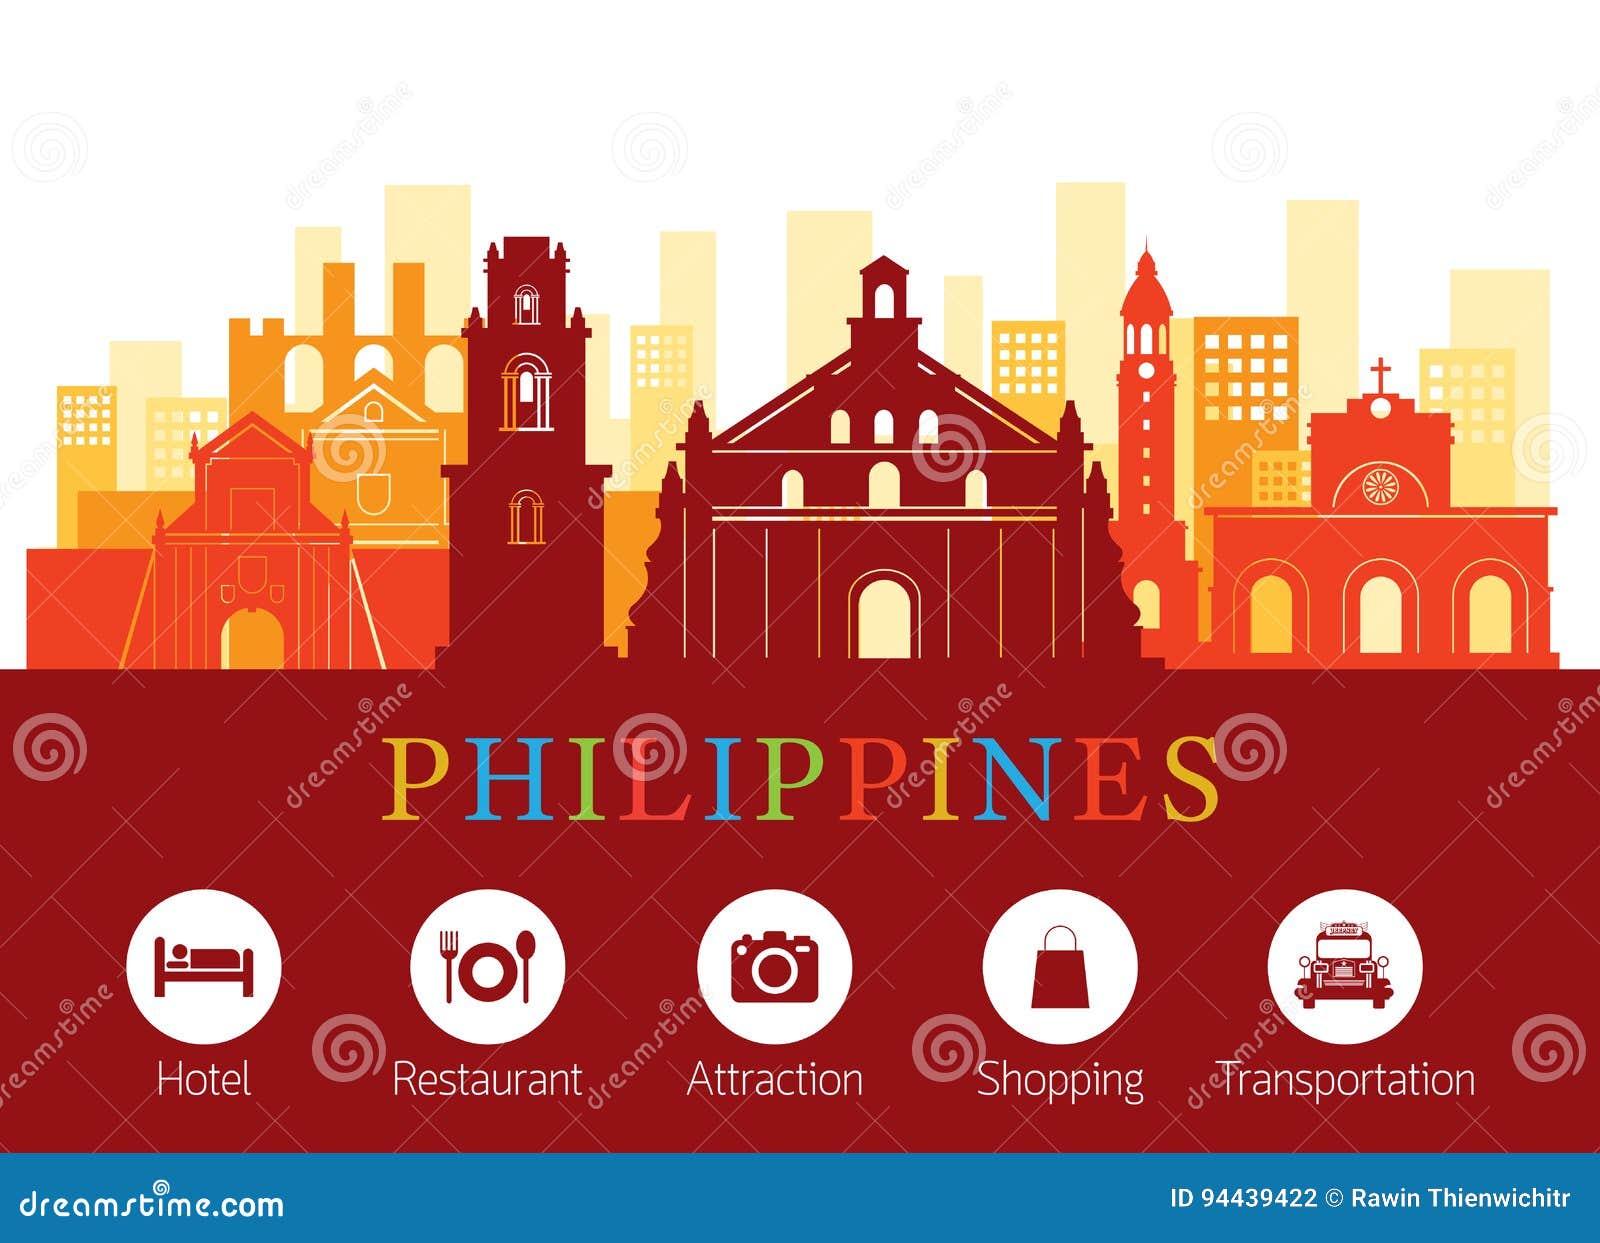 Philippines Landmarks Skyline with Accommodation Icons